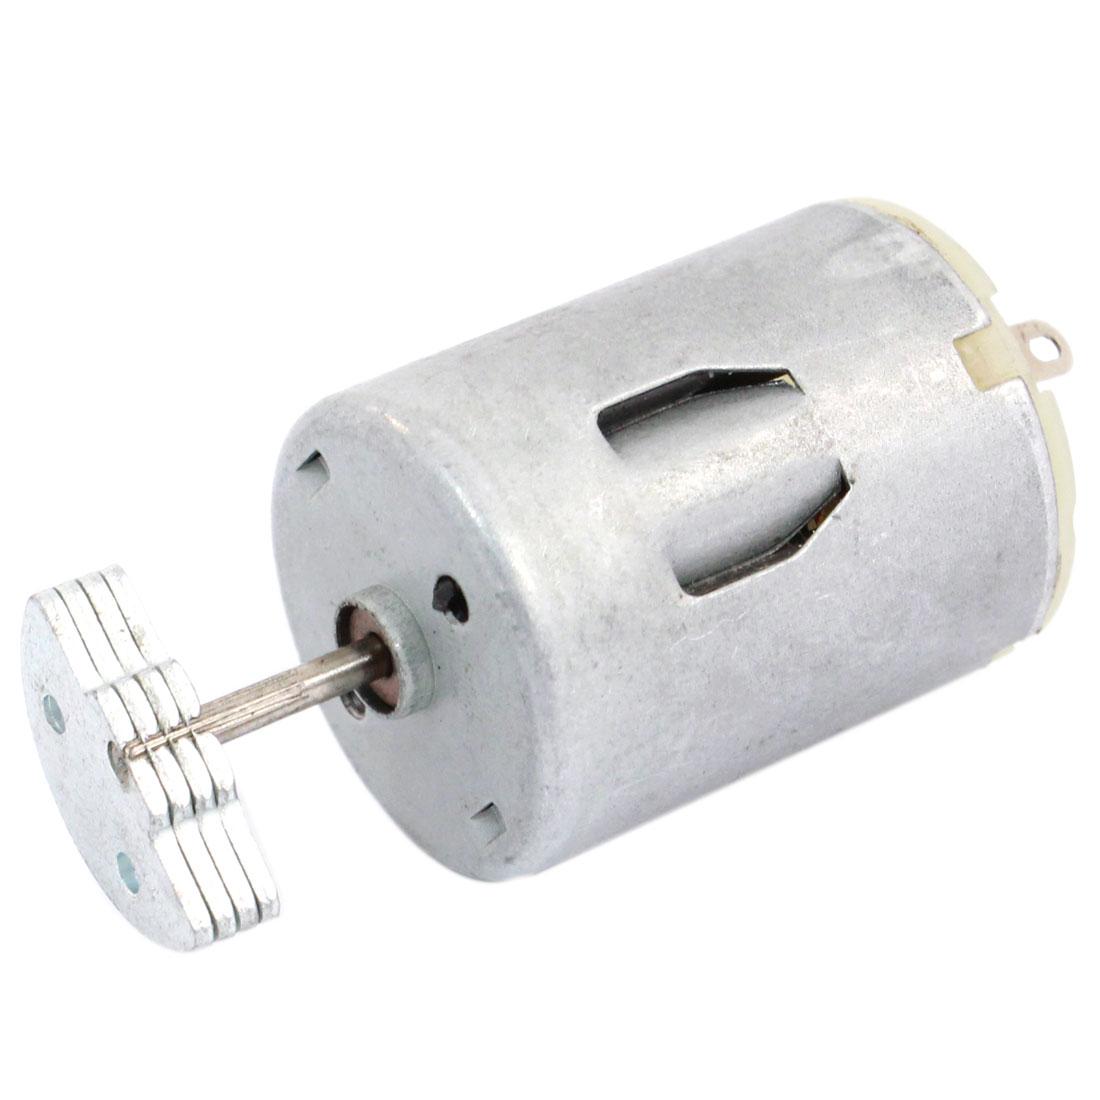 13500RPM DC 3-9V 2.2A High Torque Micro Vibration Motor Silver Tone